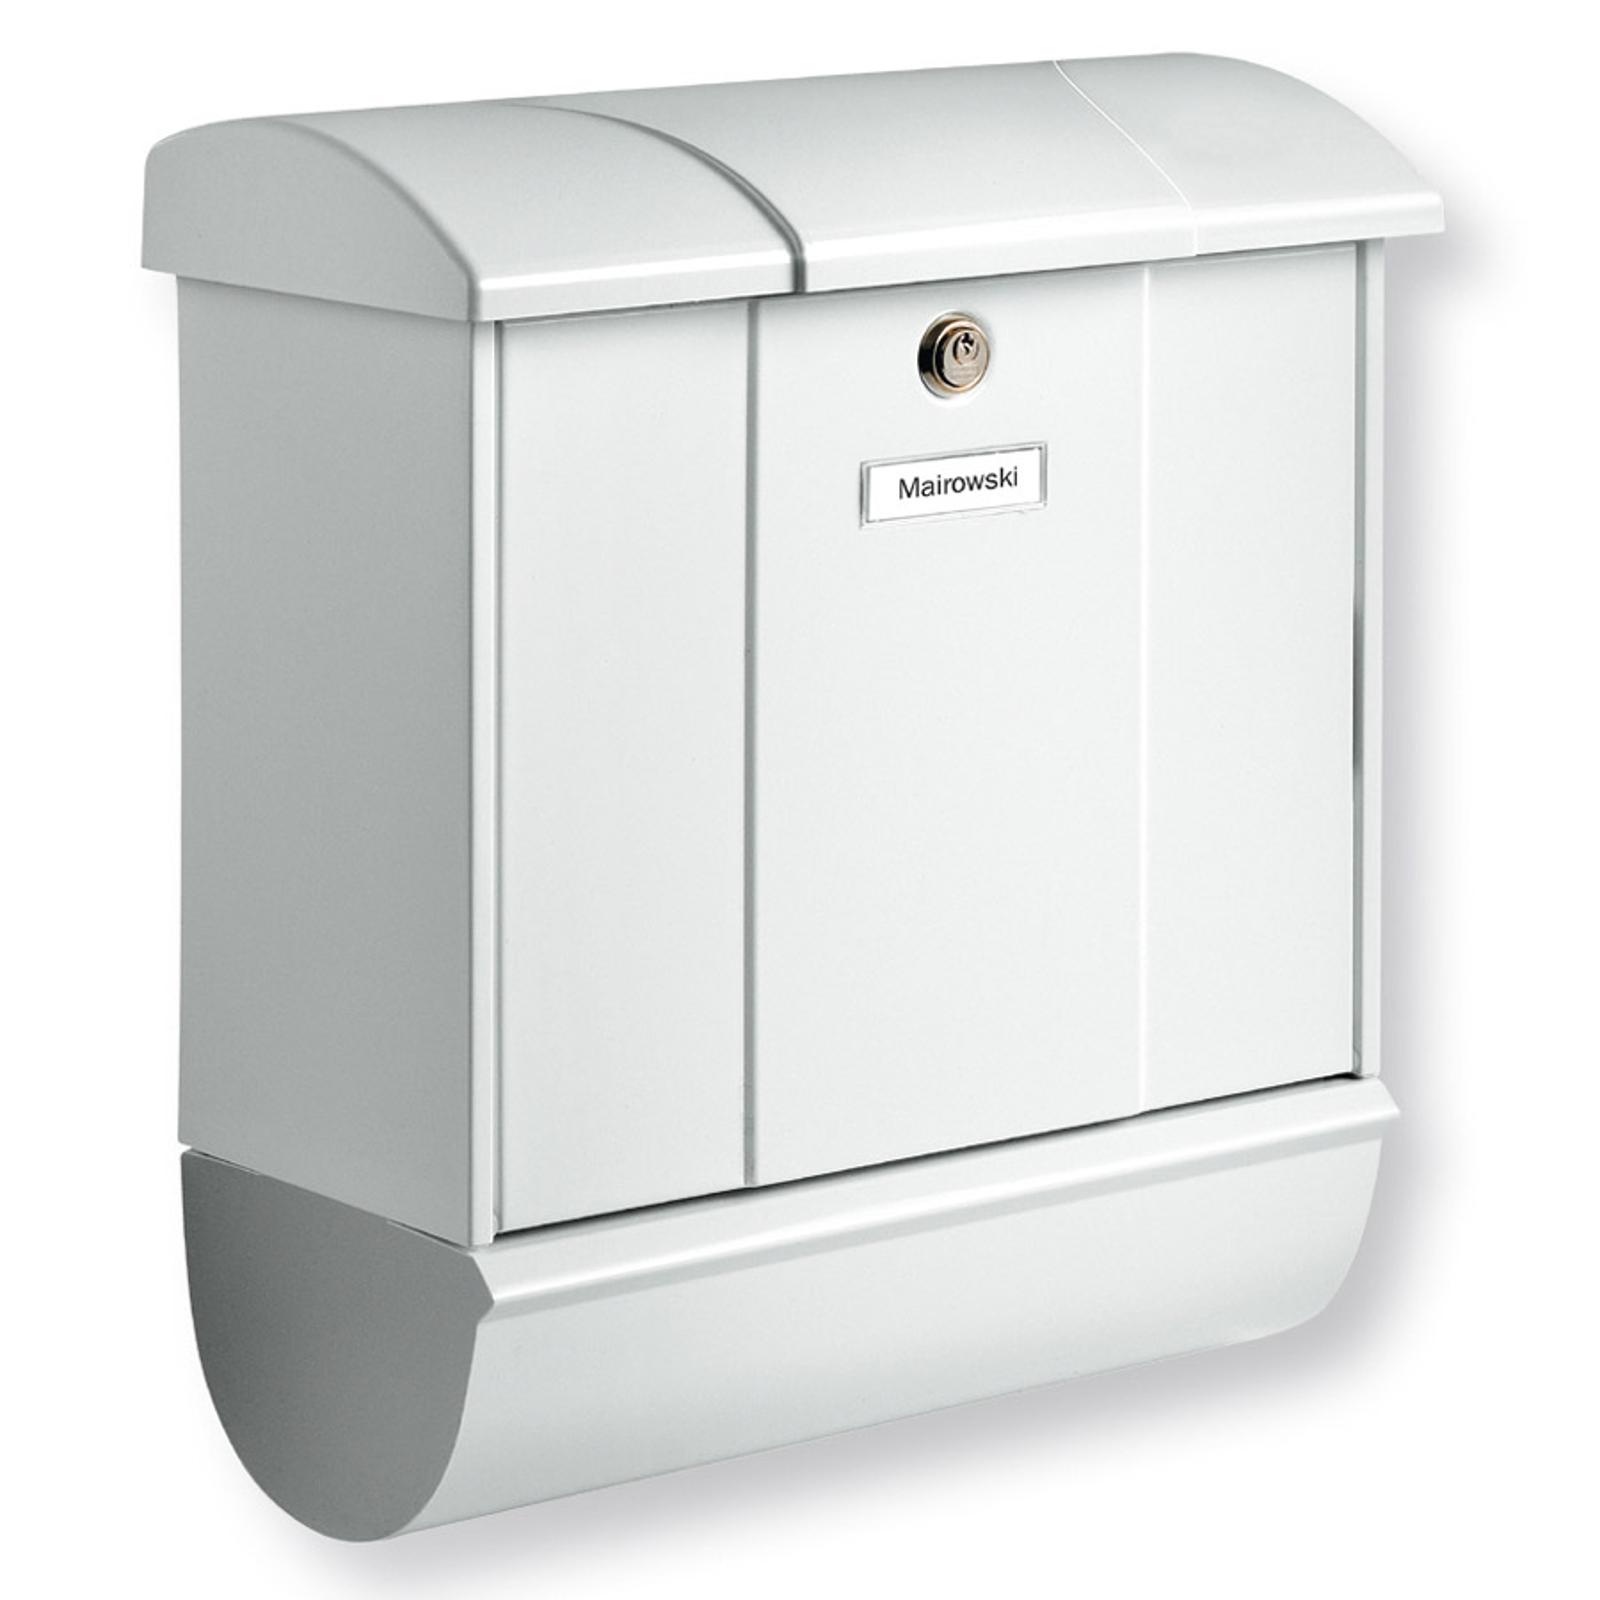 Brevlåda Olymp med tidningsfack, vit